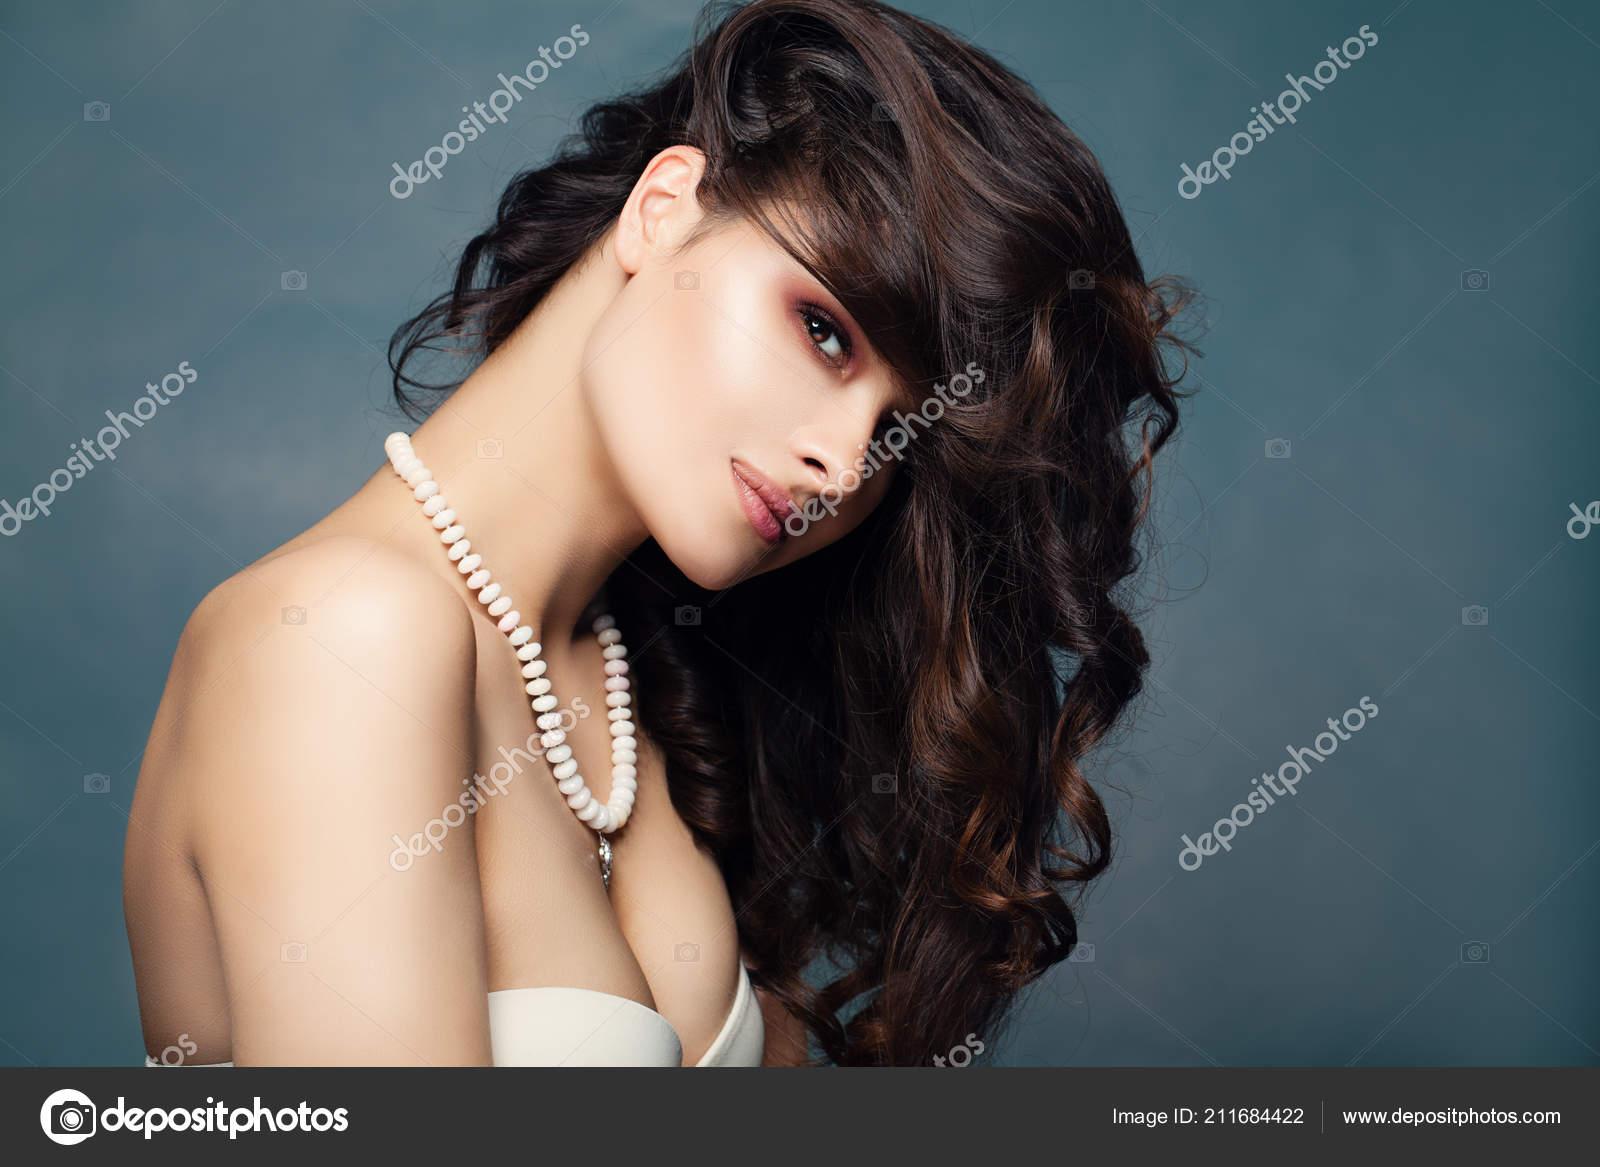 6e34d8a1f95a Retrato Moda Mujer Morena Linda Modelo Mujer Sexy Con Pelo — Foto de ...